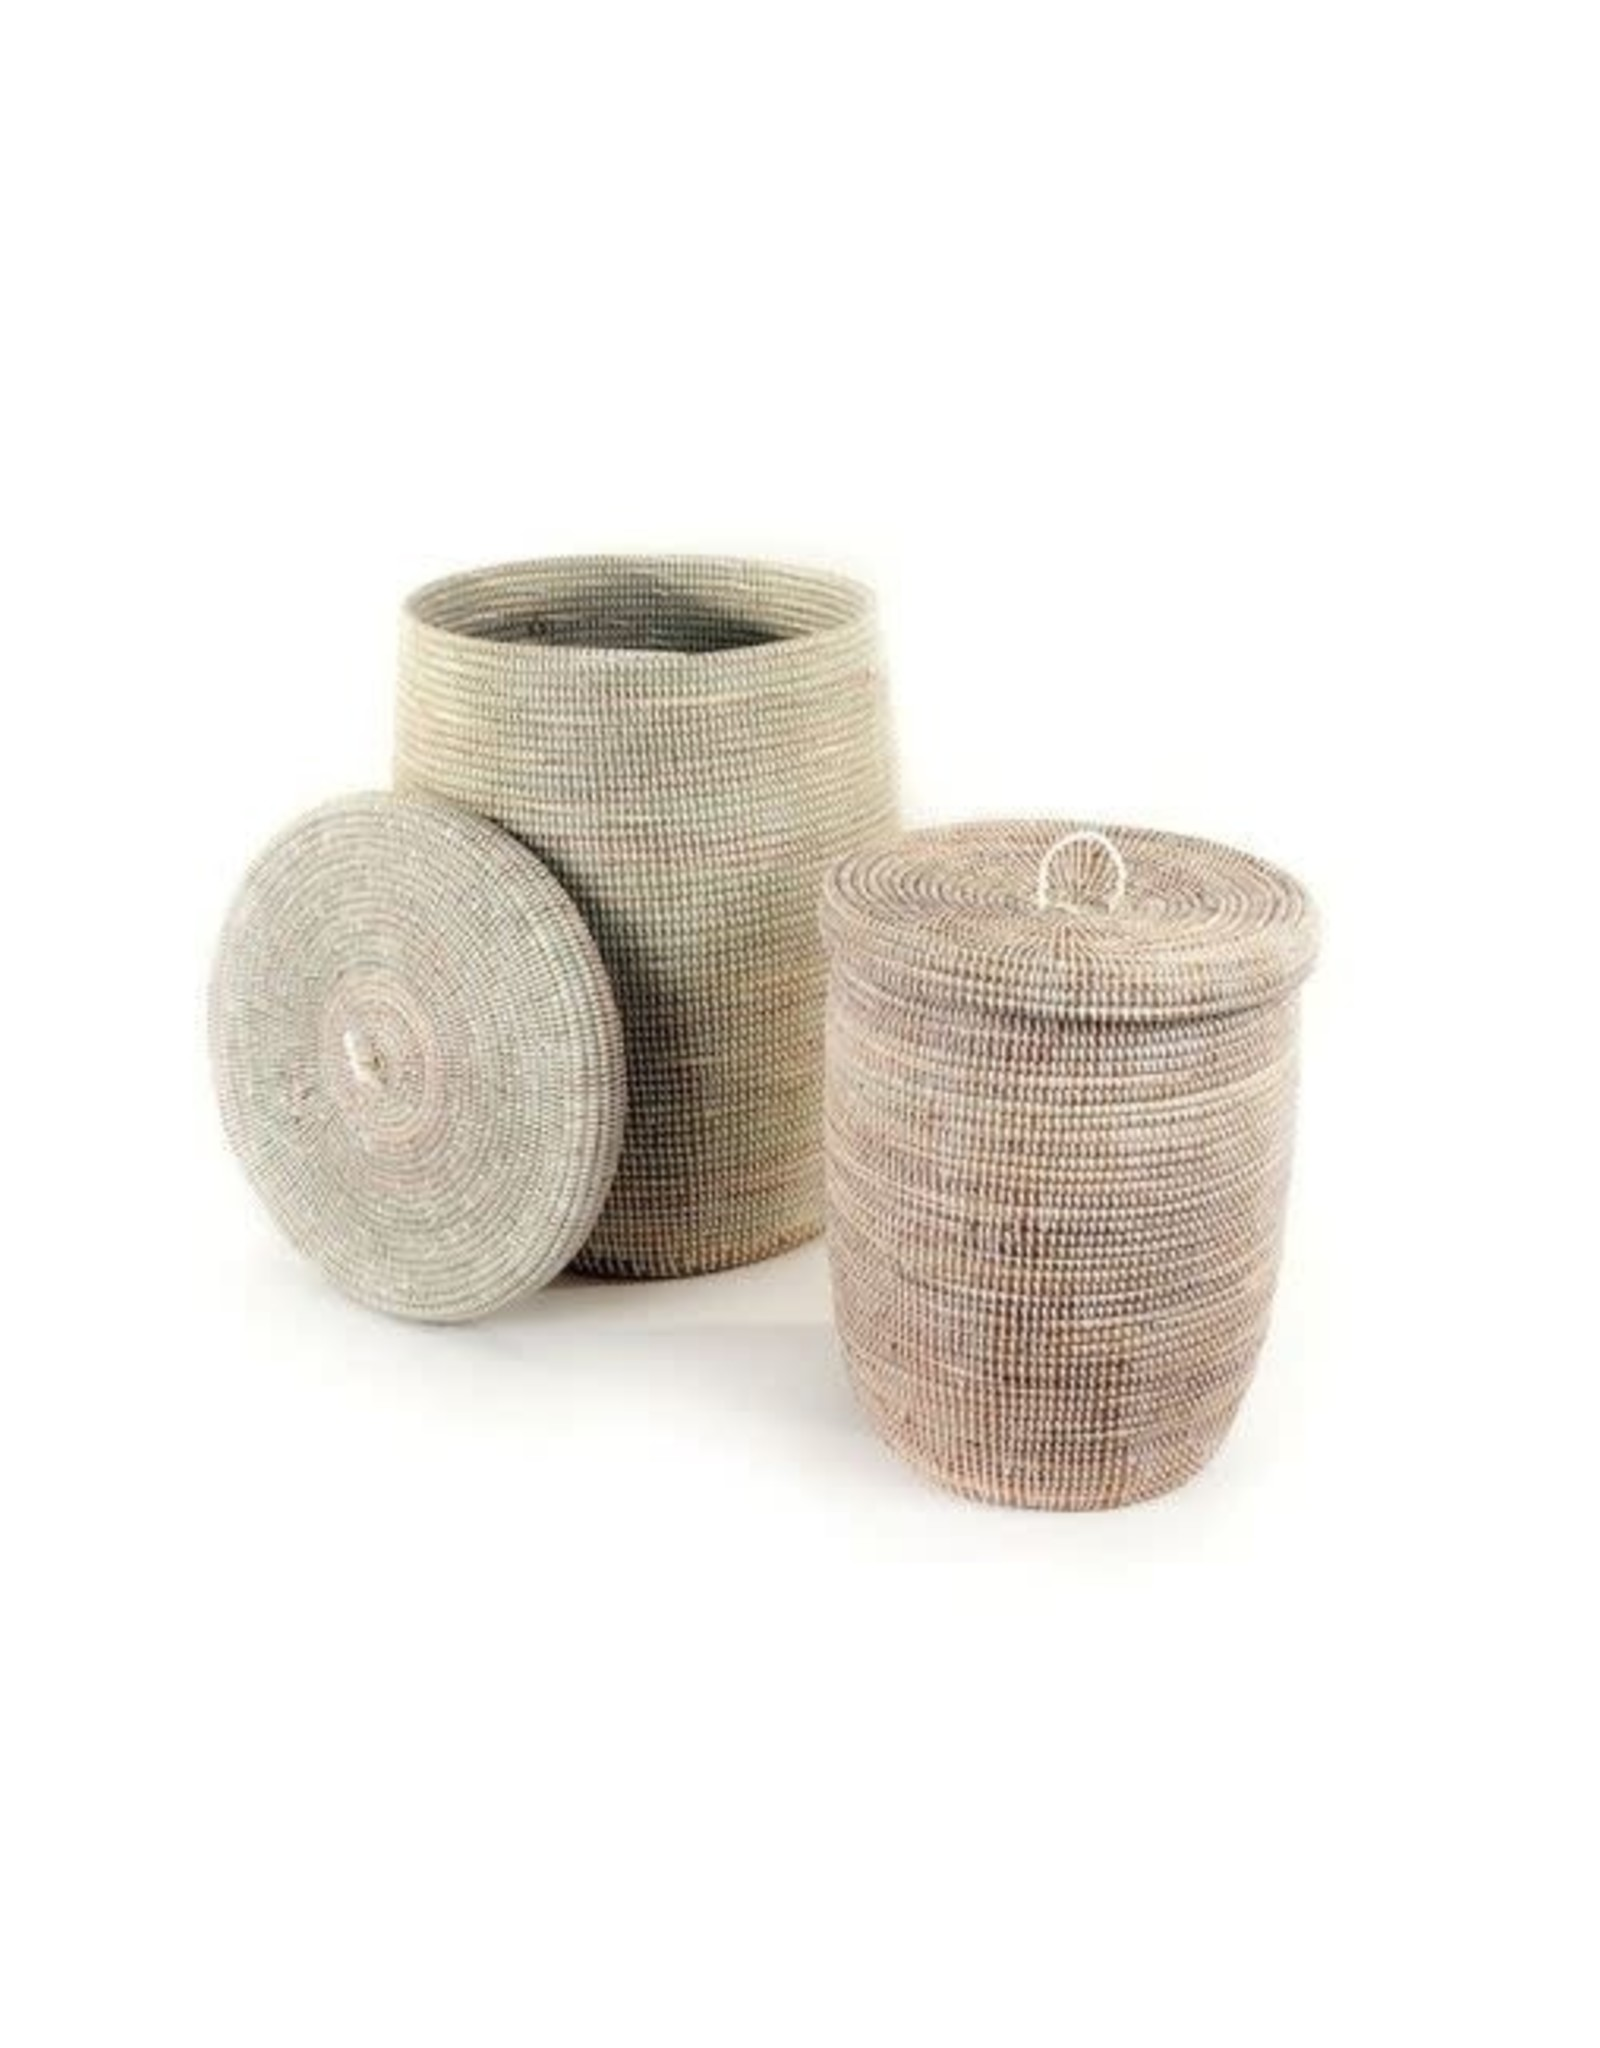 Storge Basket White Sand